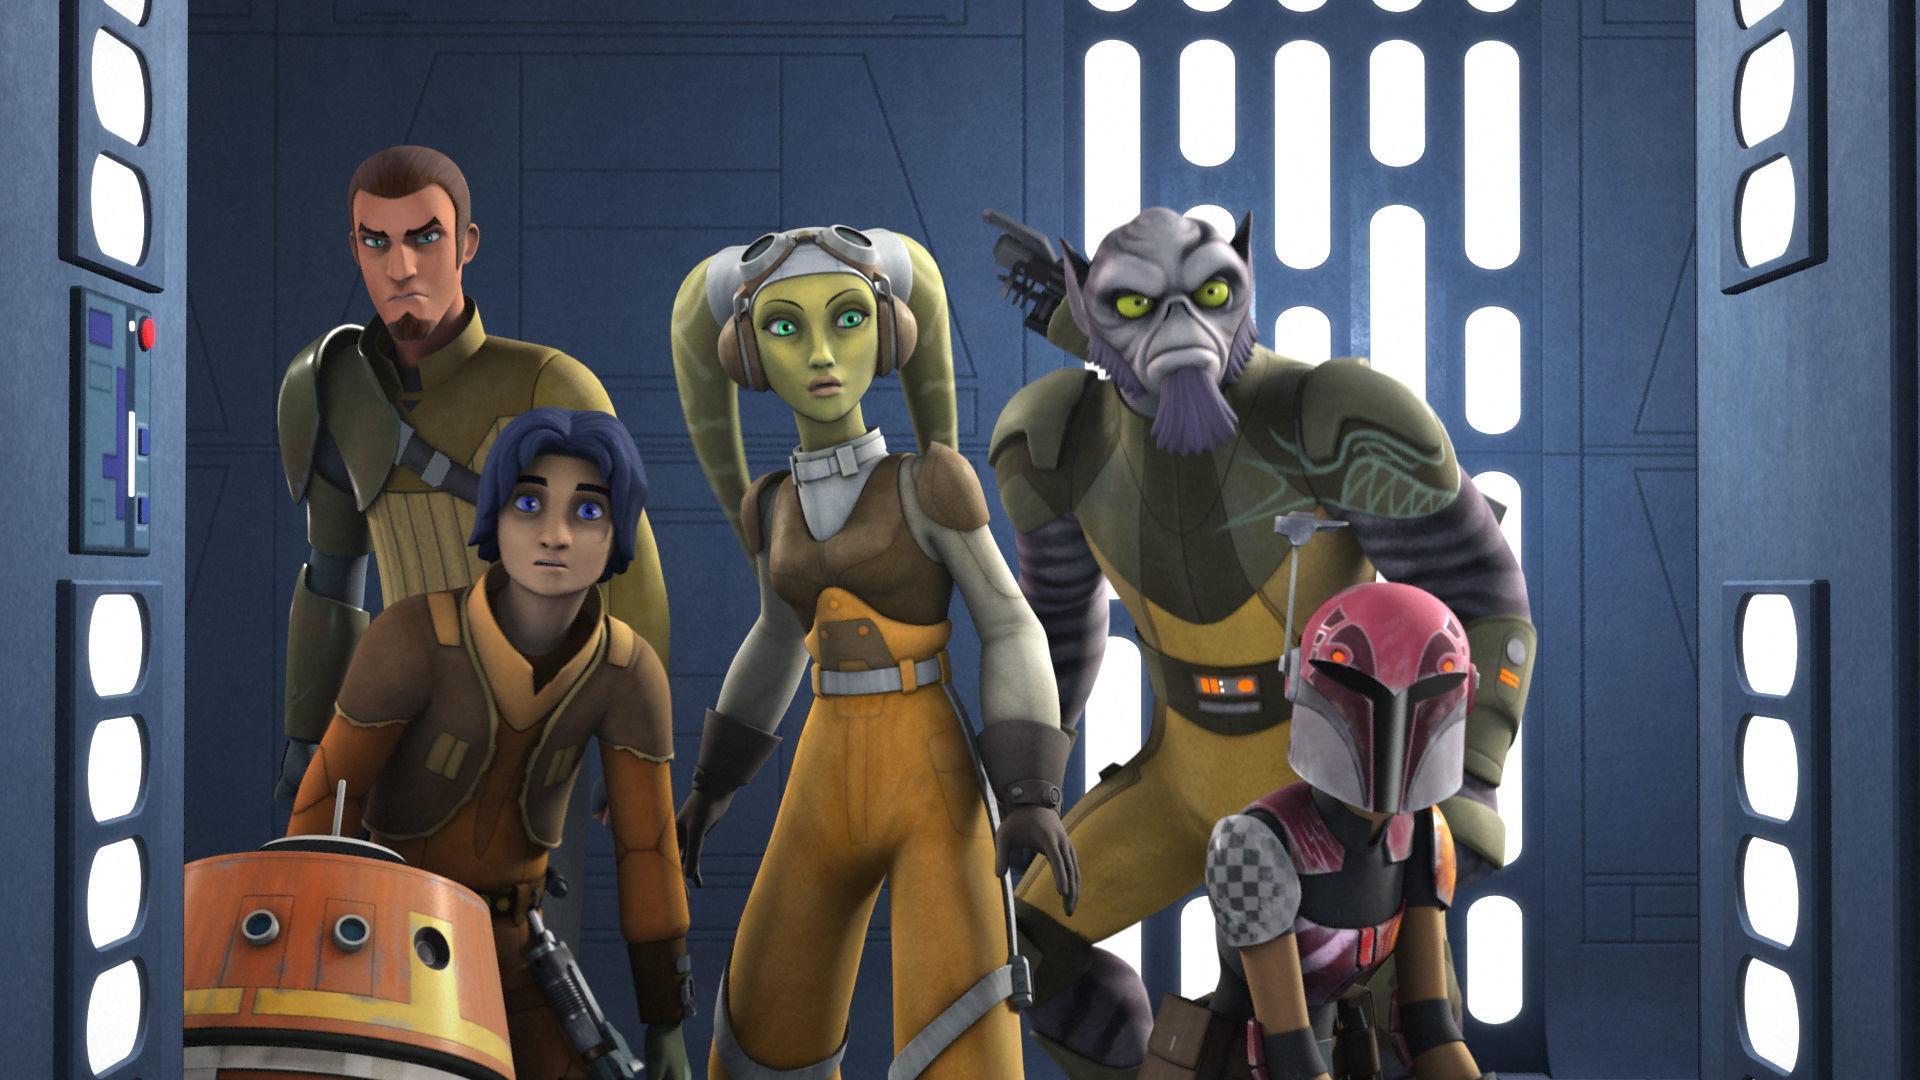 Star Wars Rebels Wallpaper HD Download - photo#41